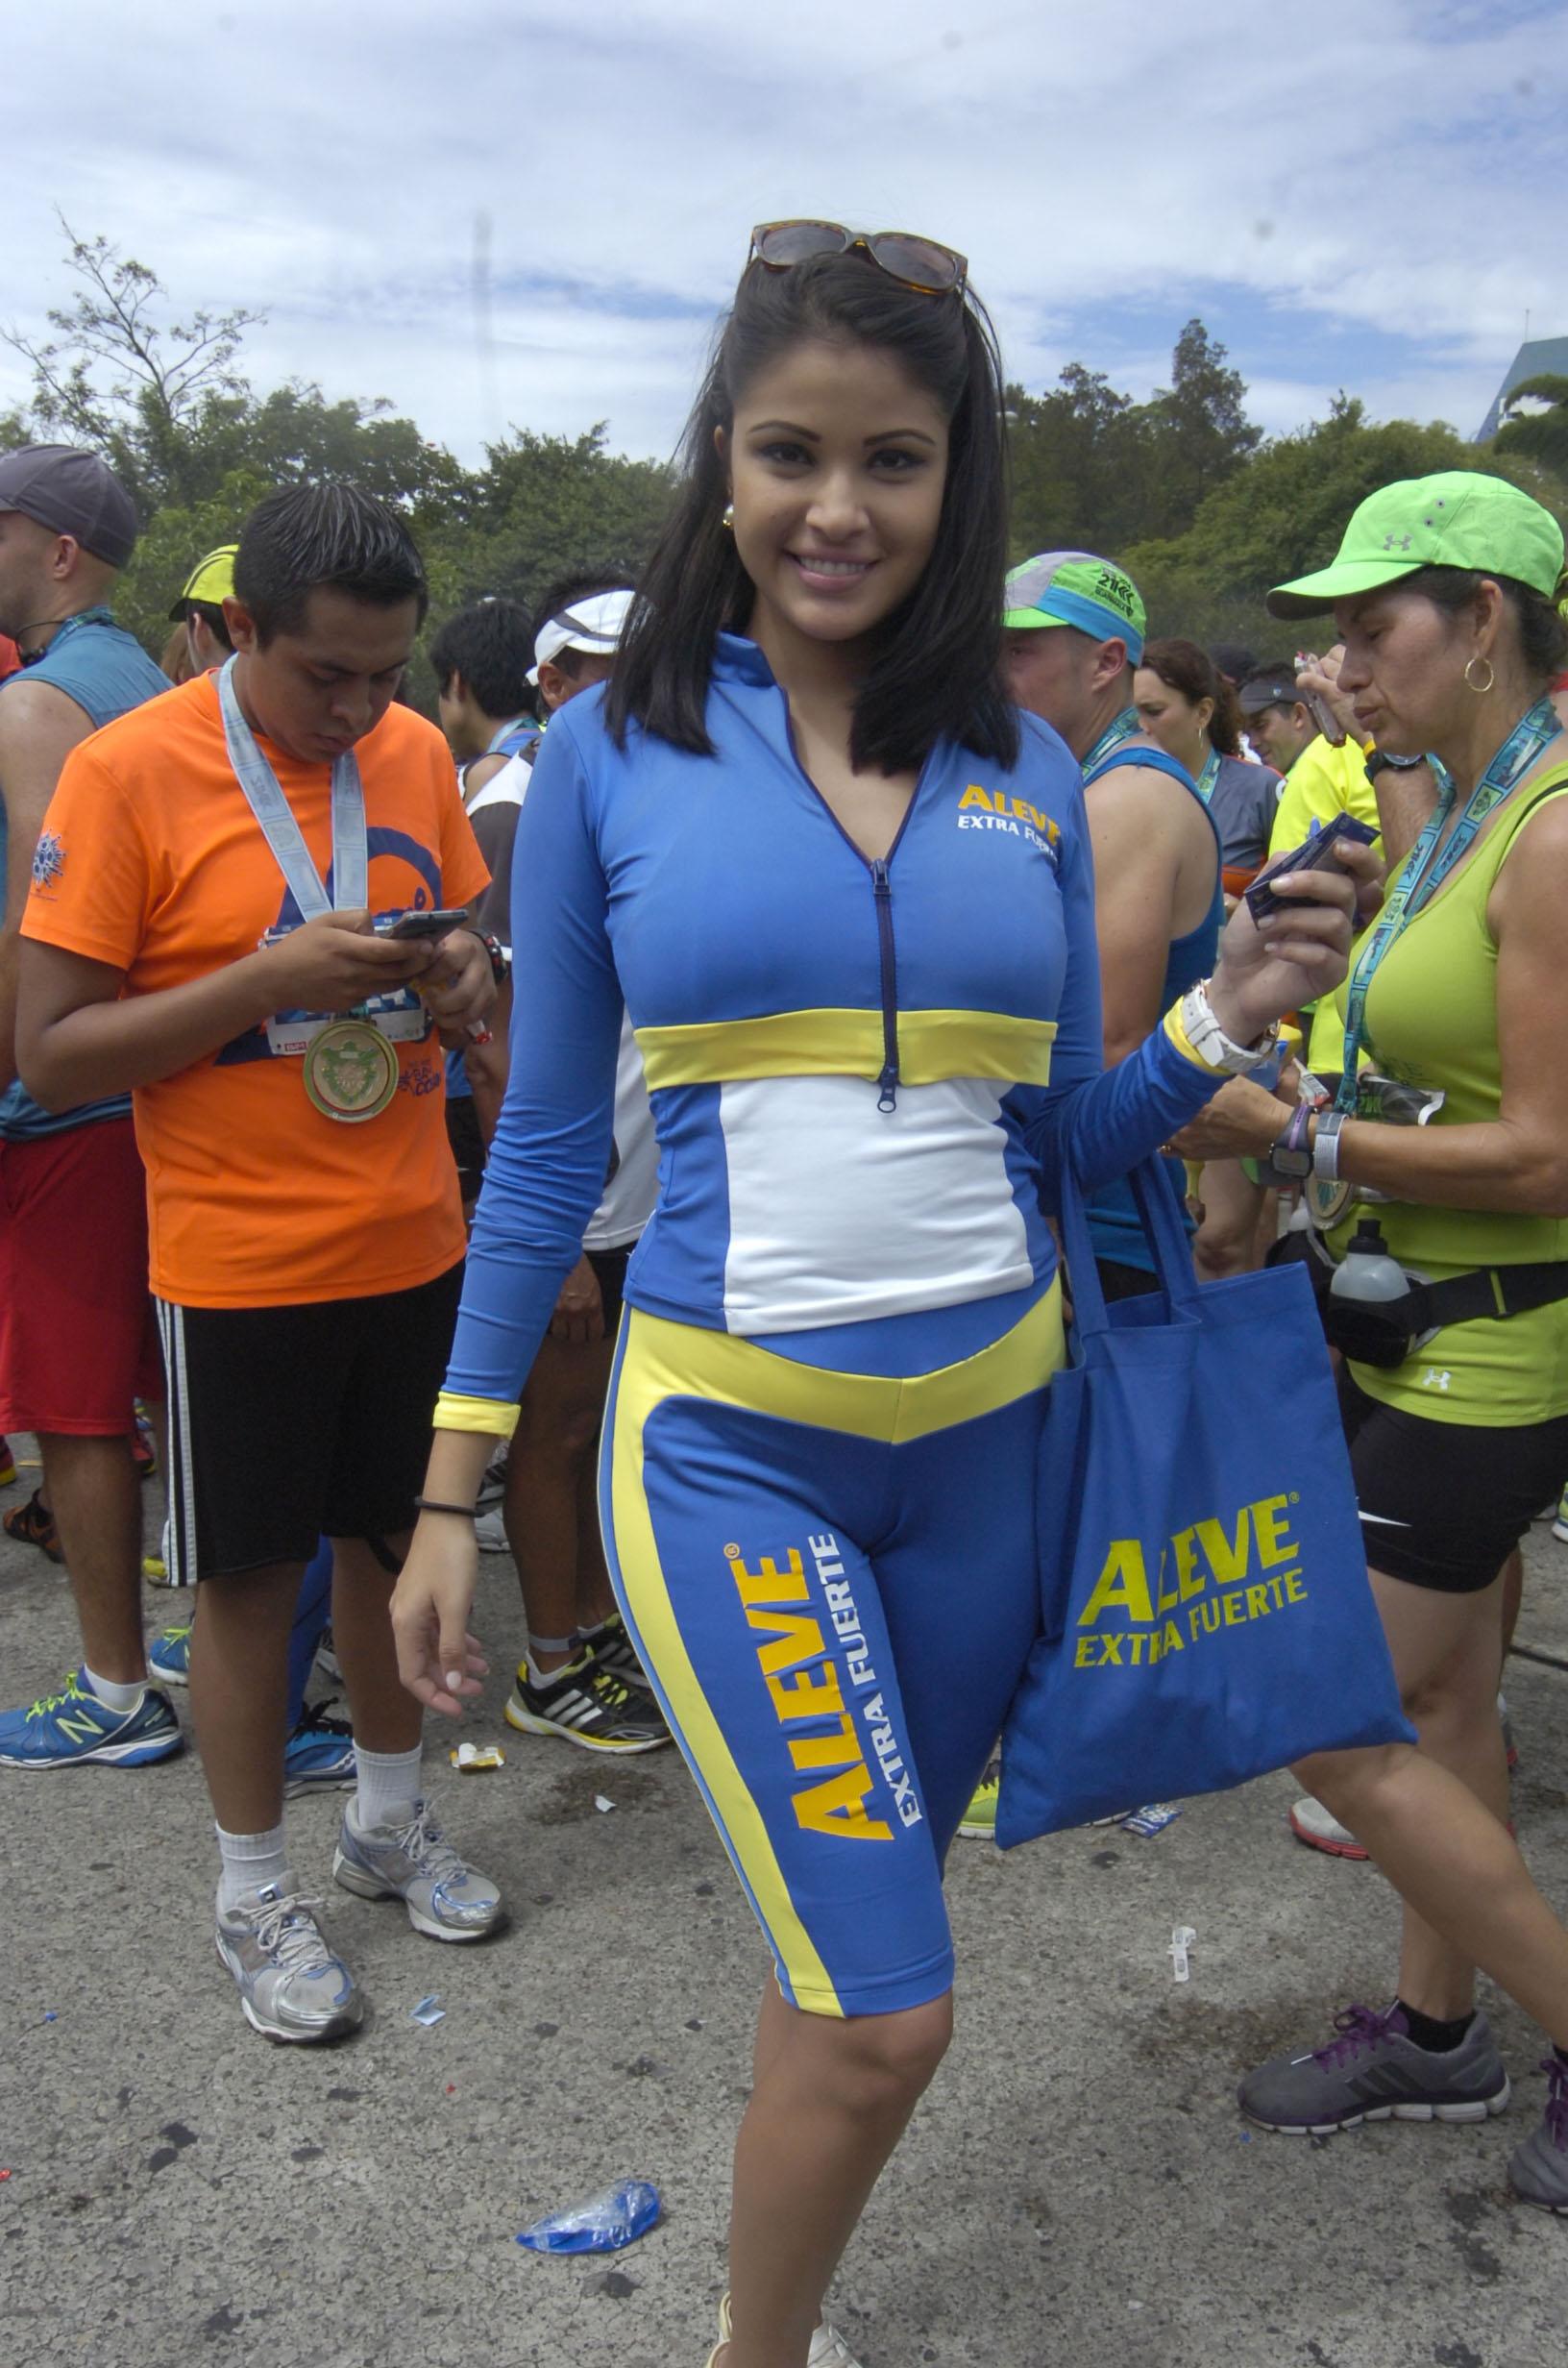 ANGY hERRERA - Venezuela 1077